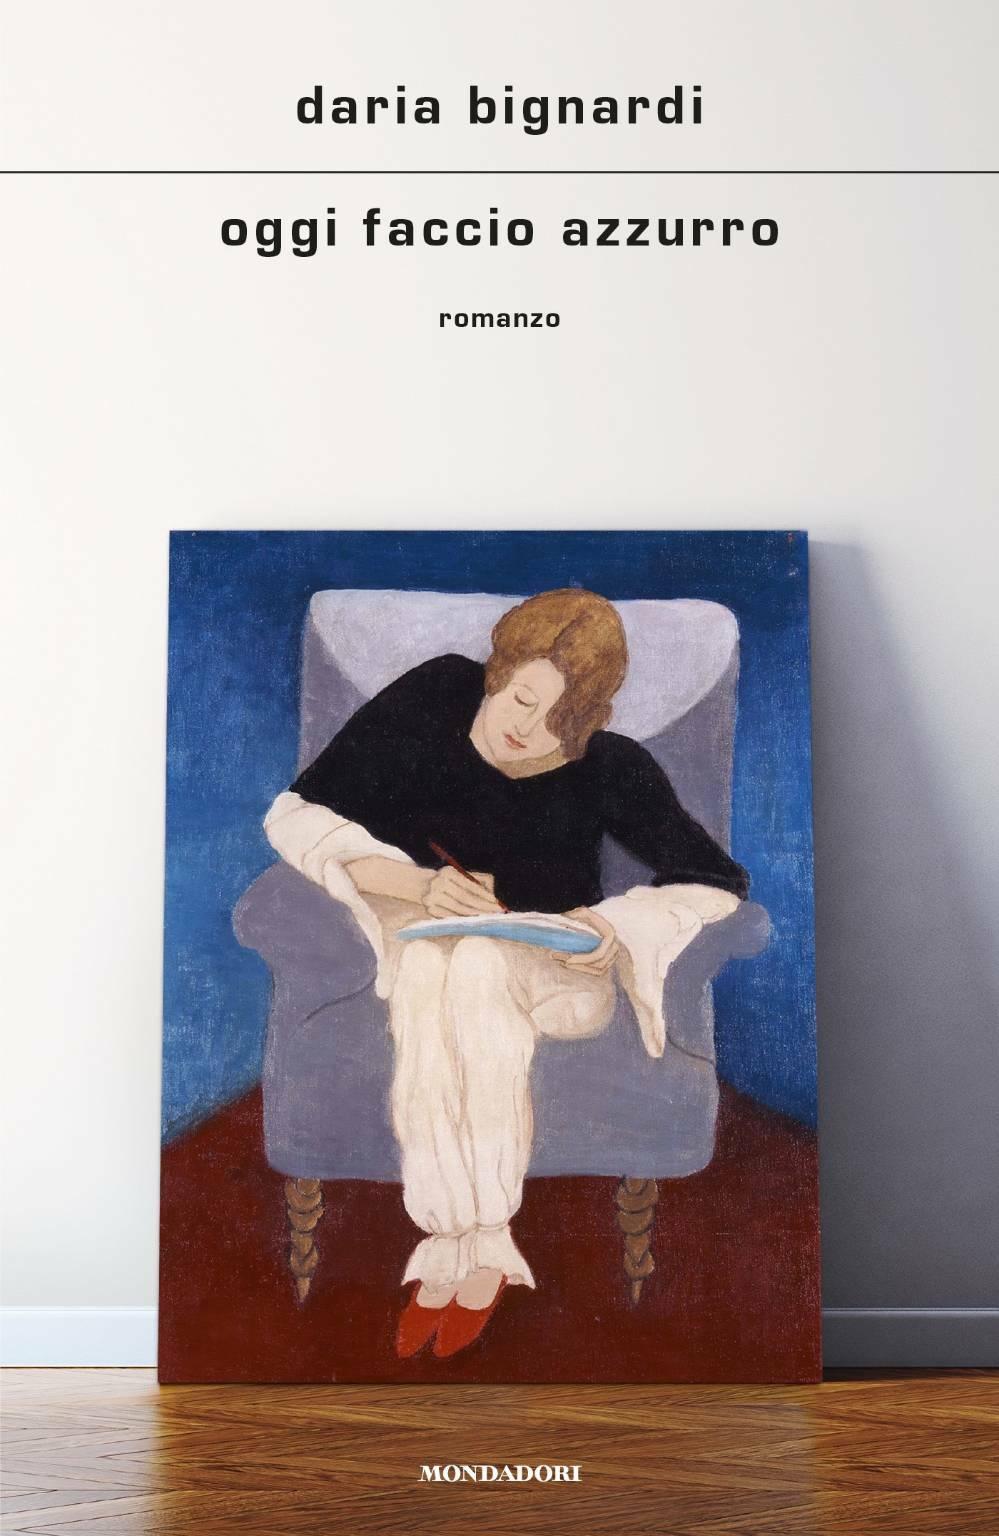 Daria Bignardi romanzo